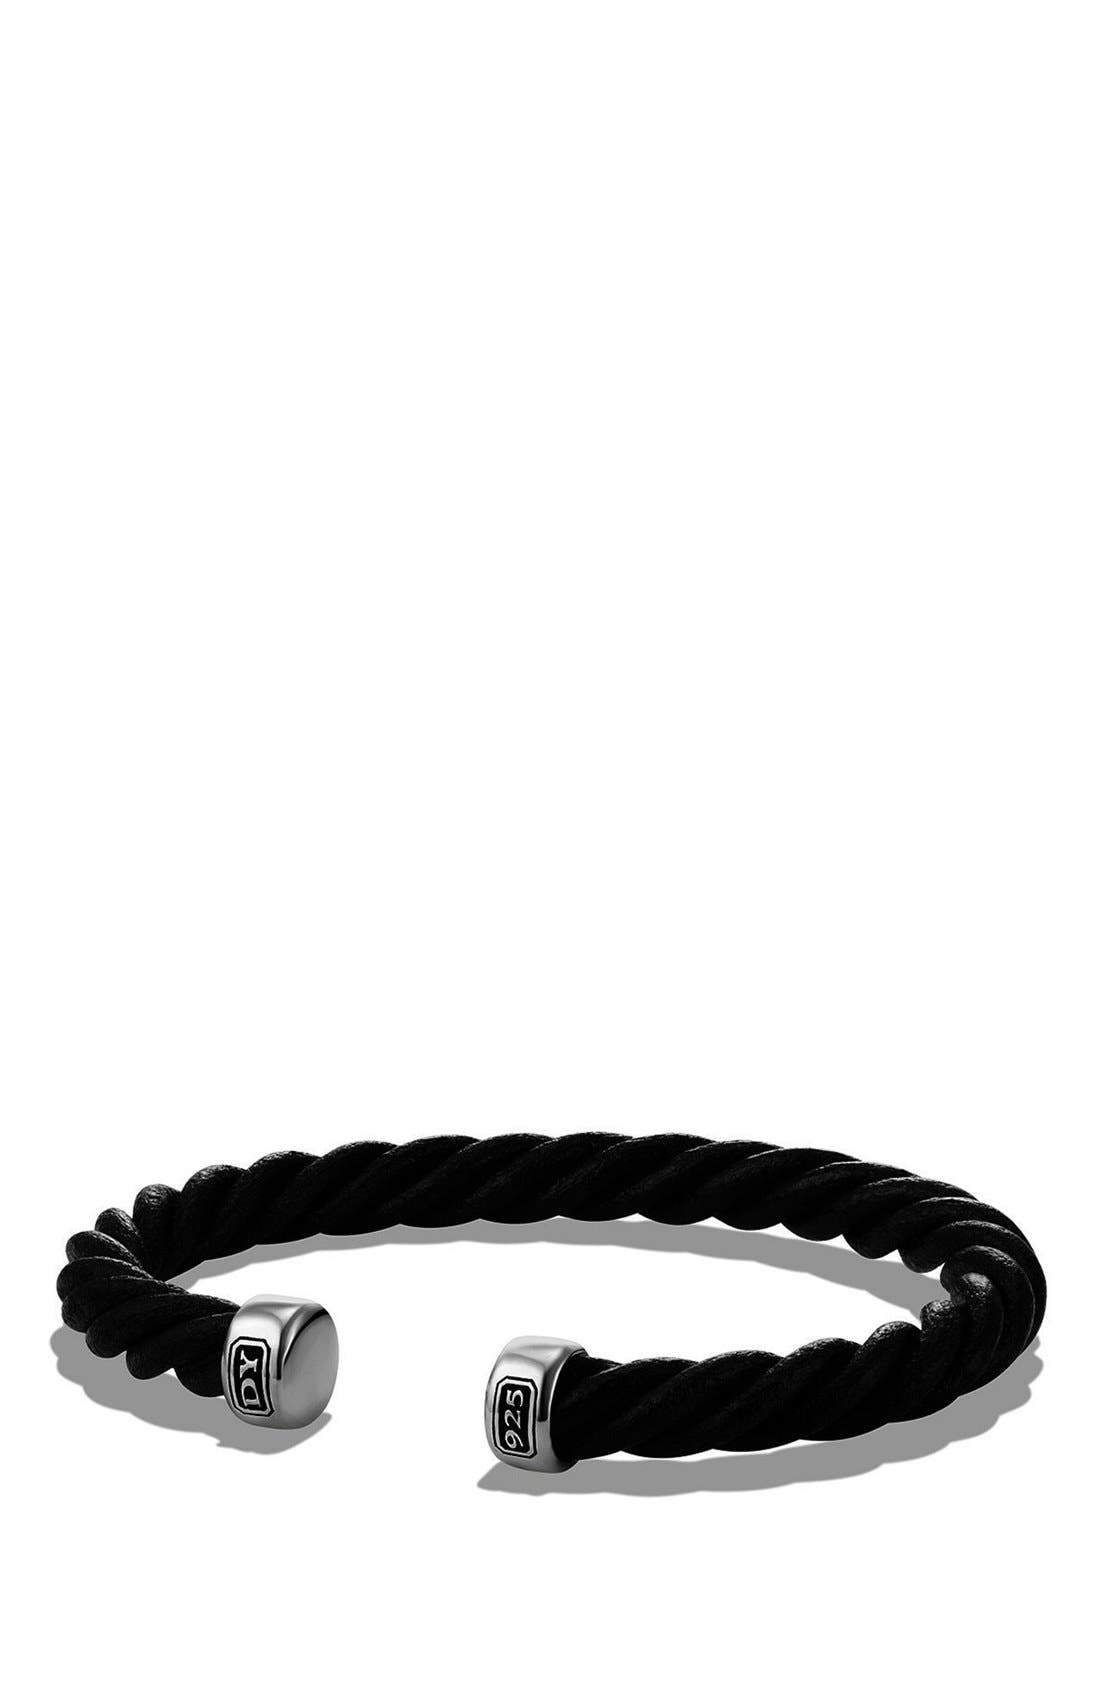 DAVID YURMAN Leather Cuff Bracelet, Main, color, SILVER/ BLACK LEATHER